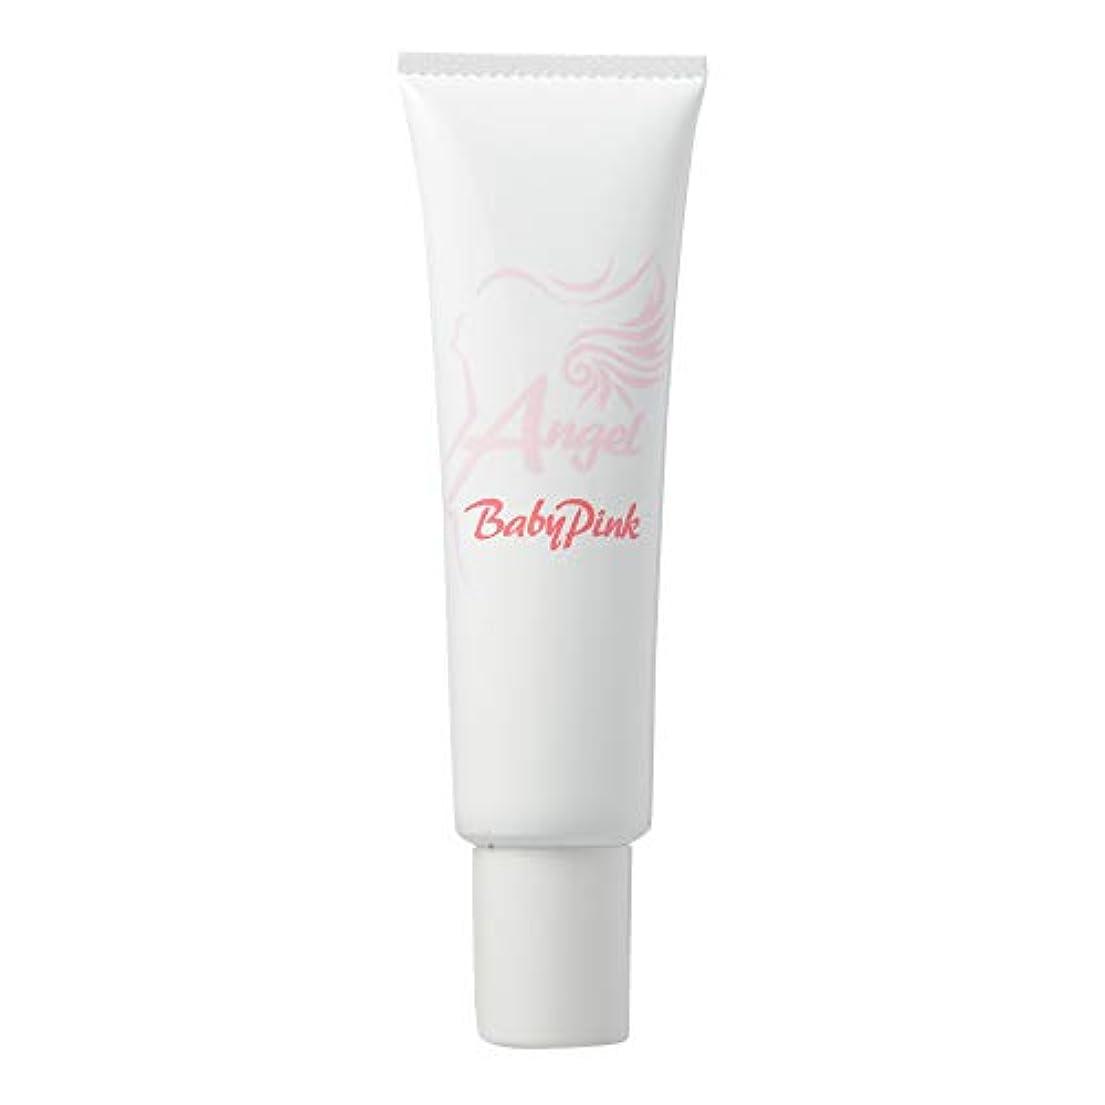 Angel Baby Pink (エンジェルベビーピンク) ボディ用 クリーム 医薬部外品 [内容量60g/説明書付き]